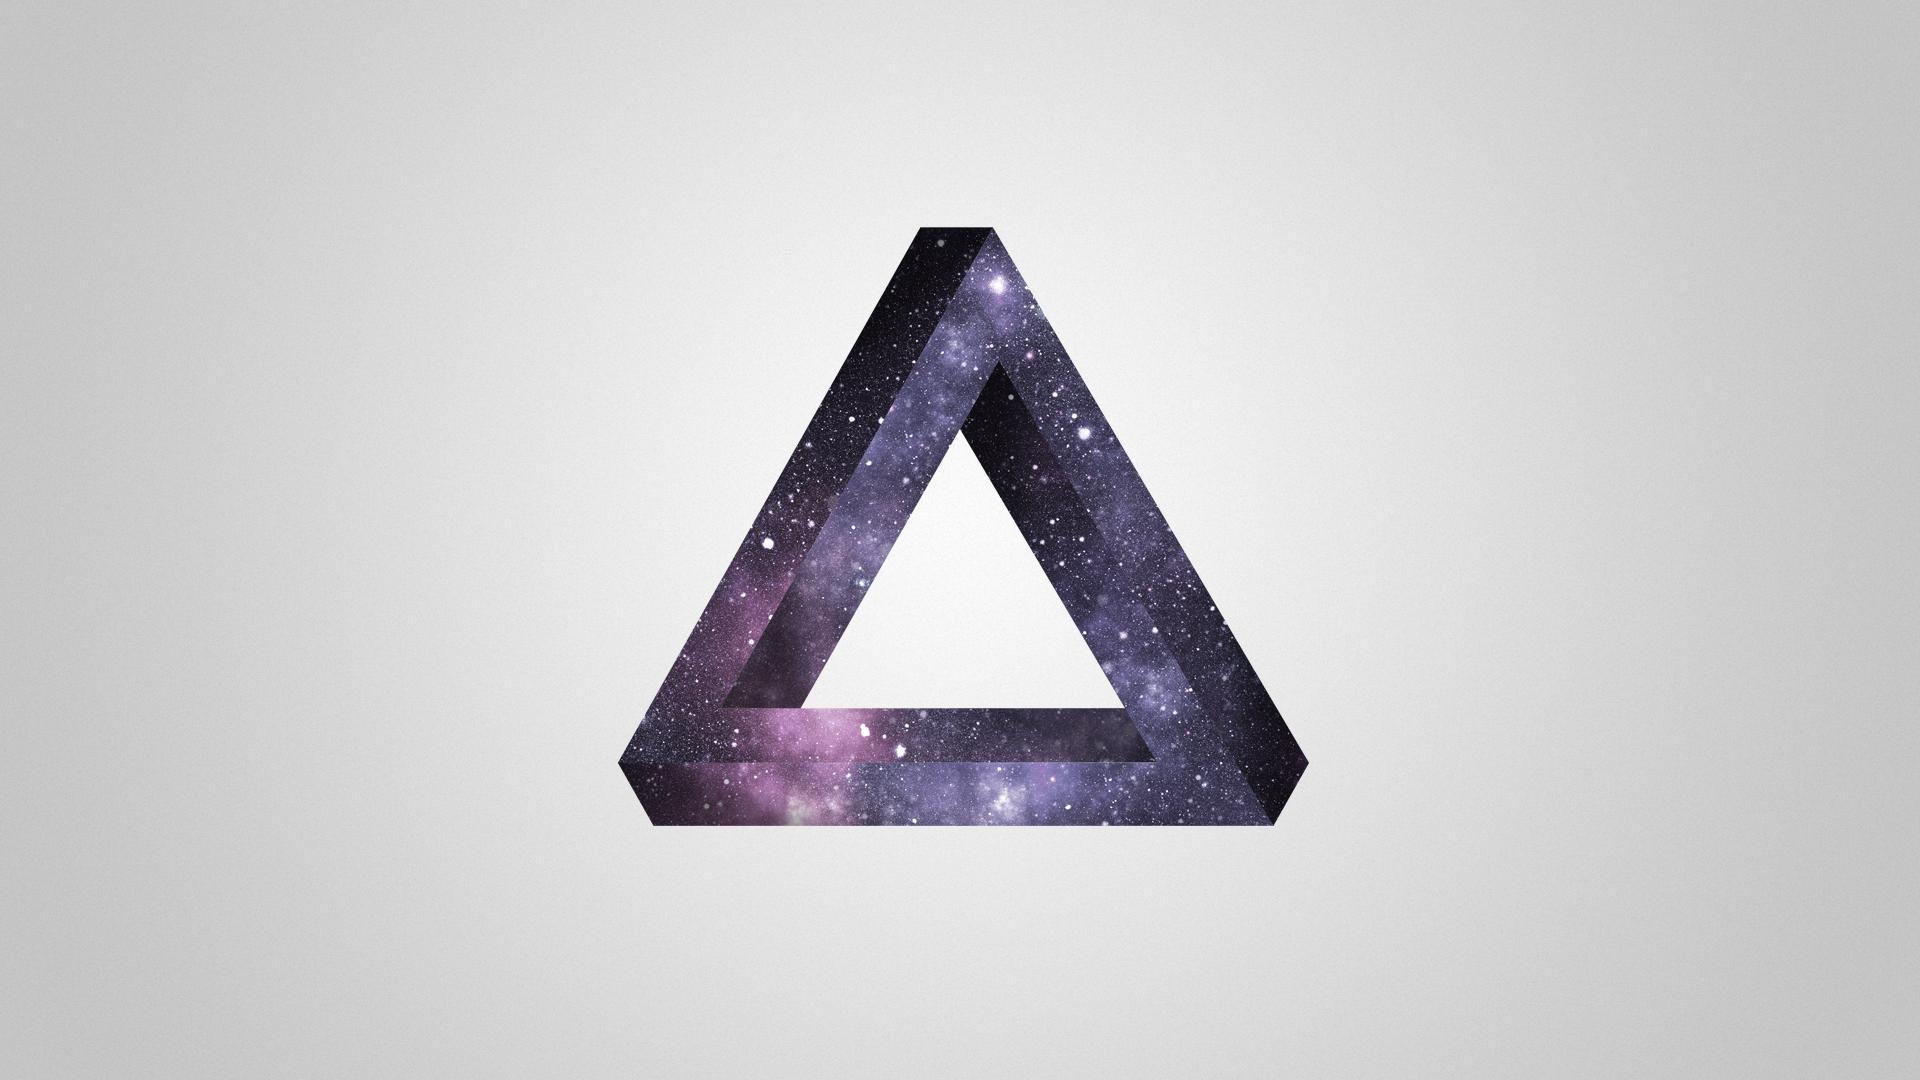 galaxy penrose triangle art amp photography pinterest